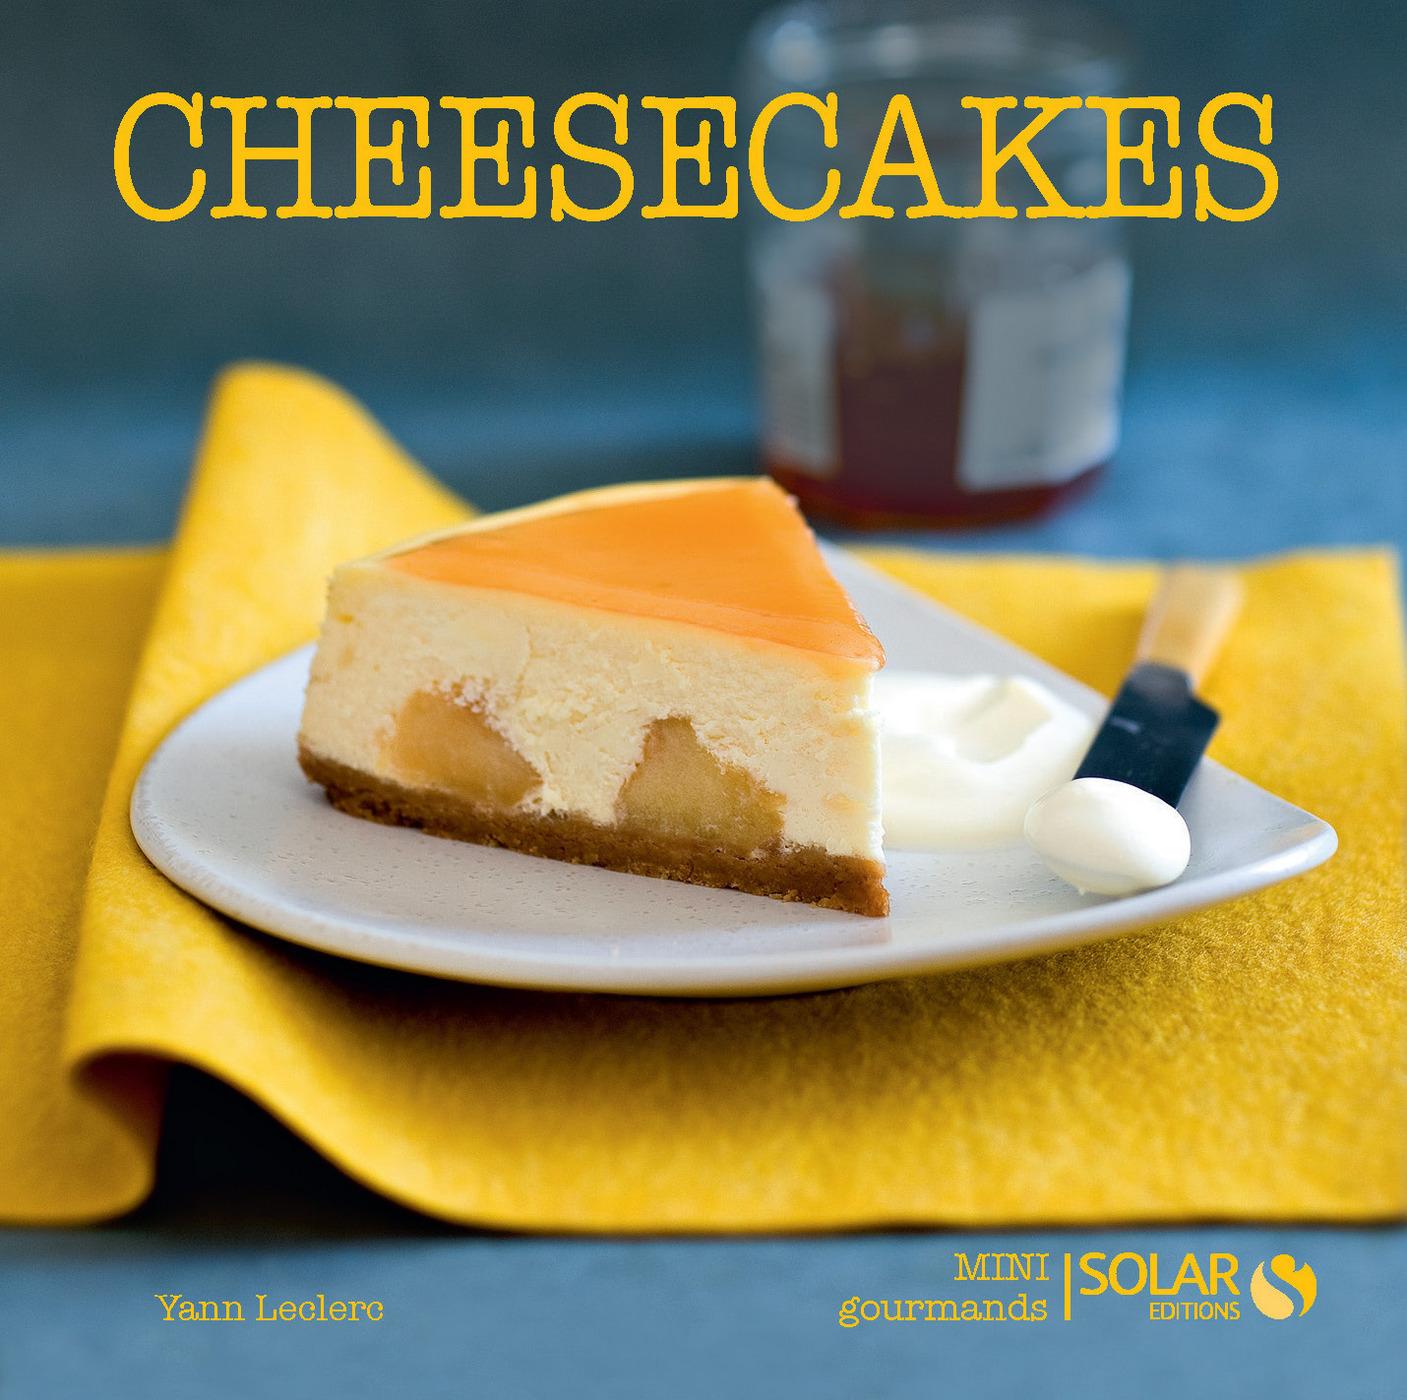 Vignette du livre Cheesecakes - Variations Gourmandes